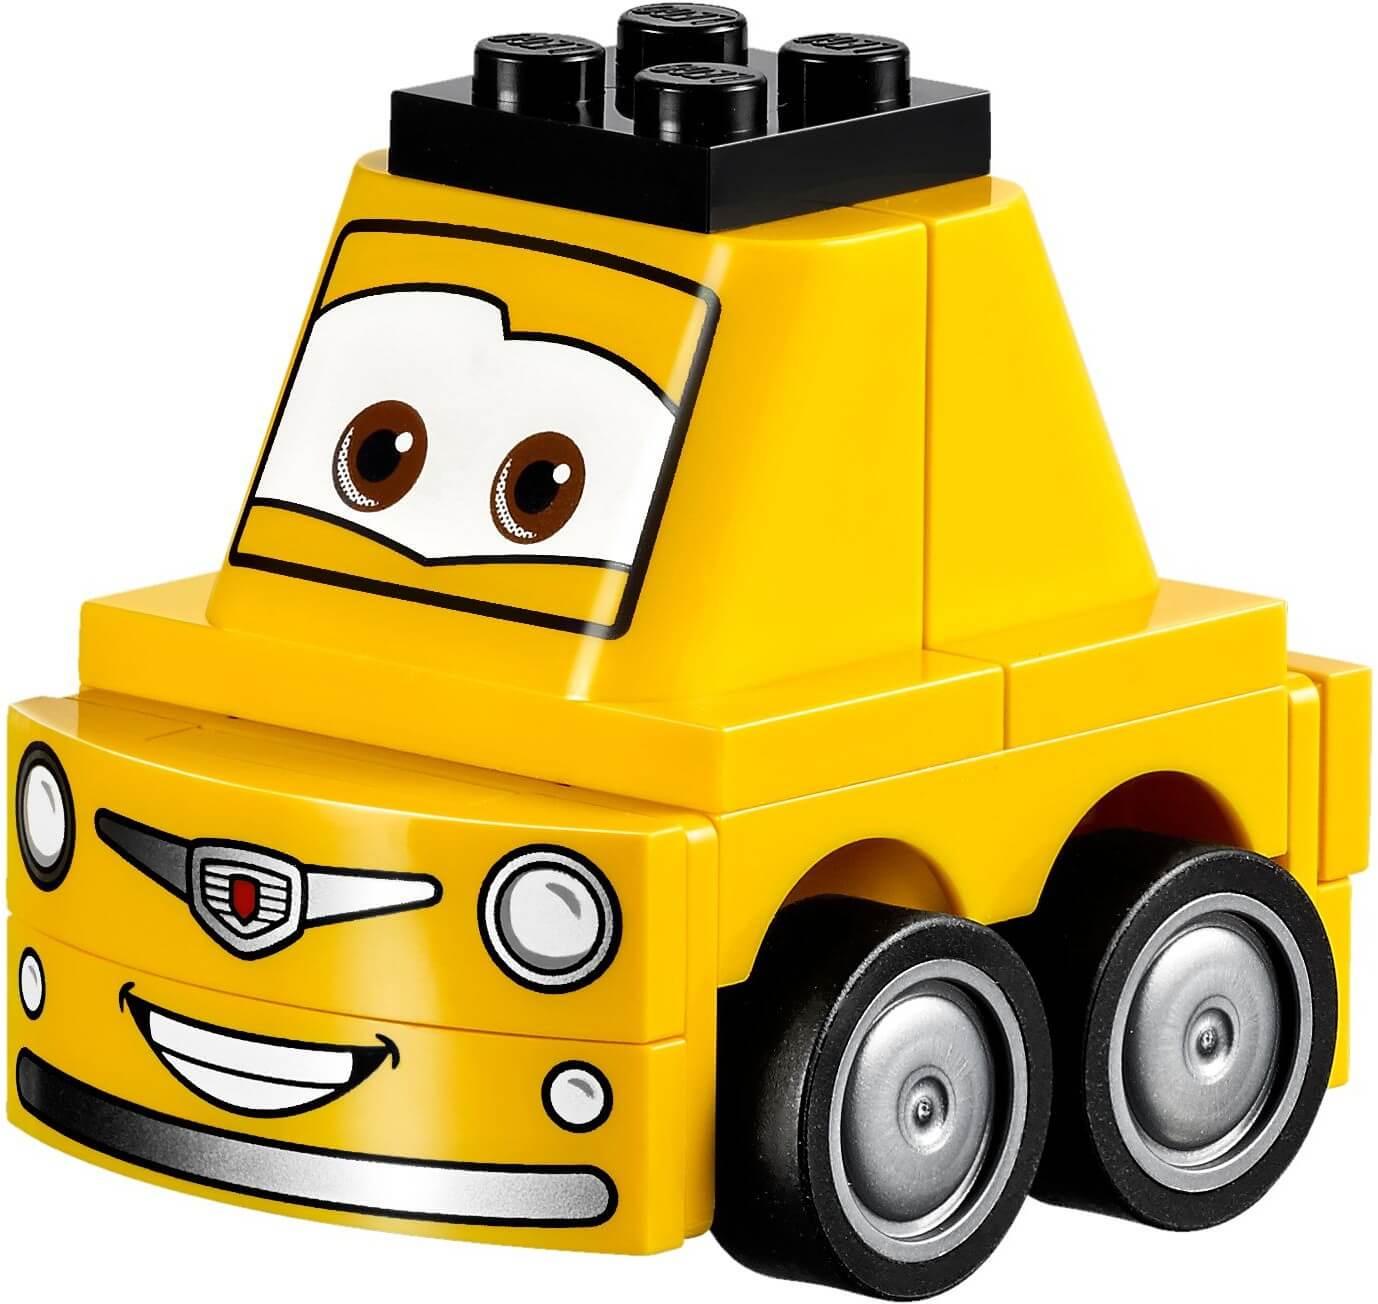 Mua đồ chơi LEGO 10732 - LEGO Juniors 10732 - Trạm Sửa Chữa của Guido và Luigi (LEGO Juniors Cars 3: Guido and Luigi's Pit Stop)